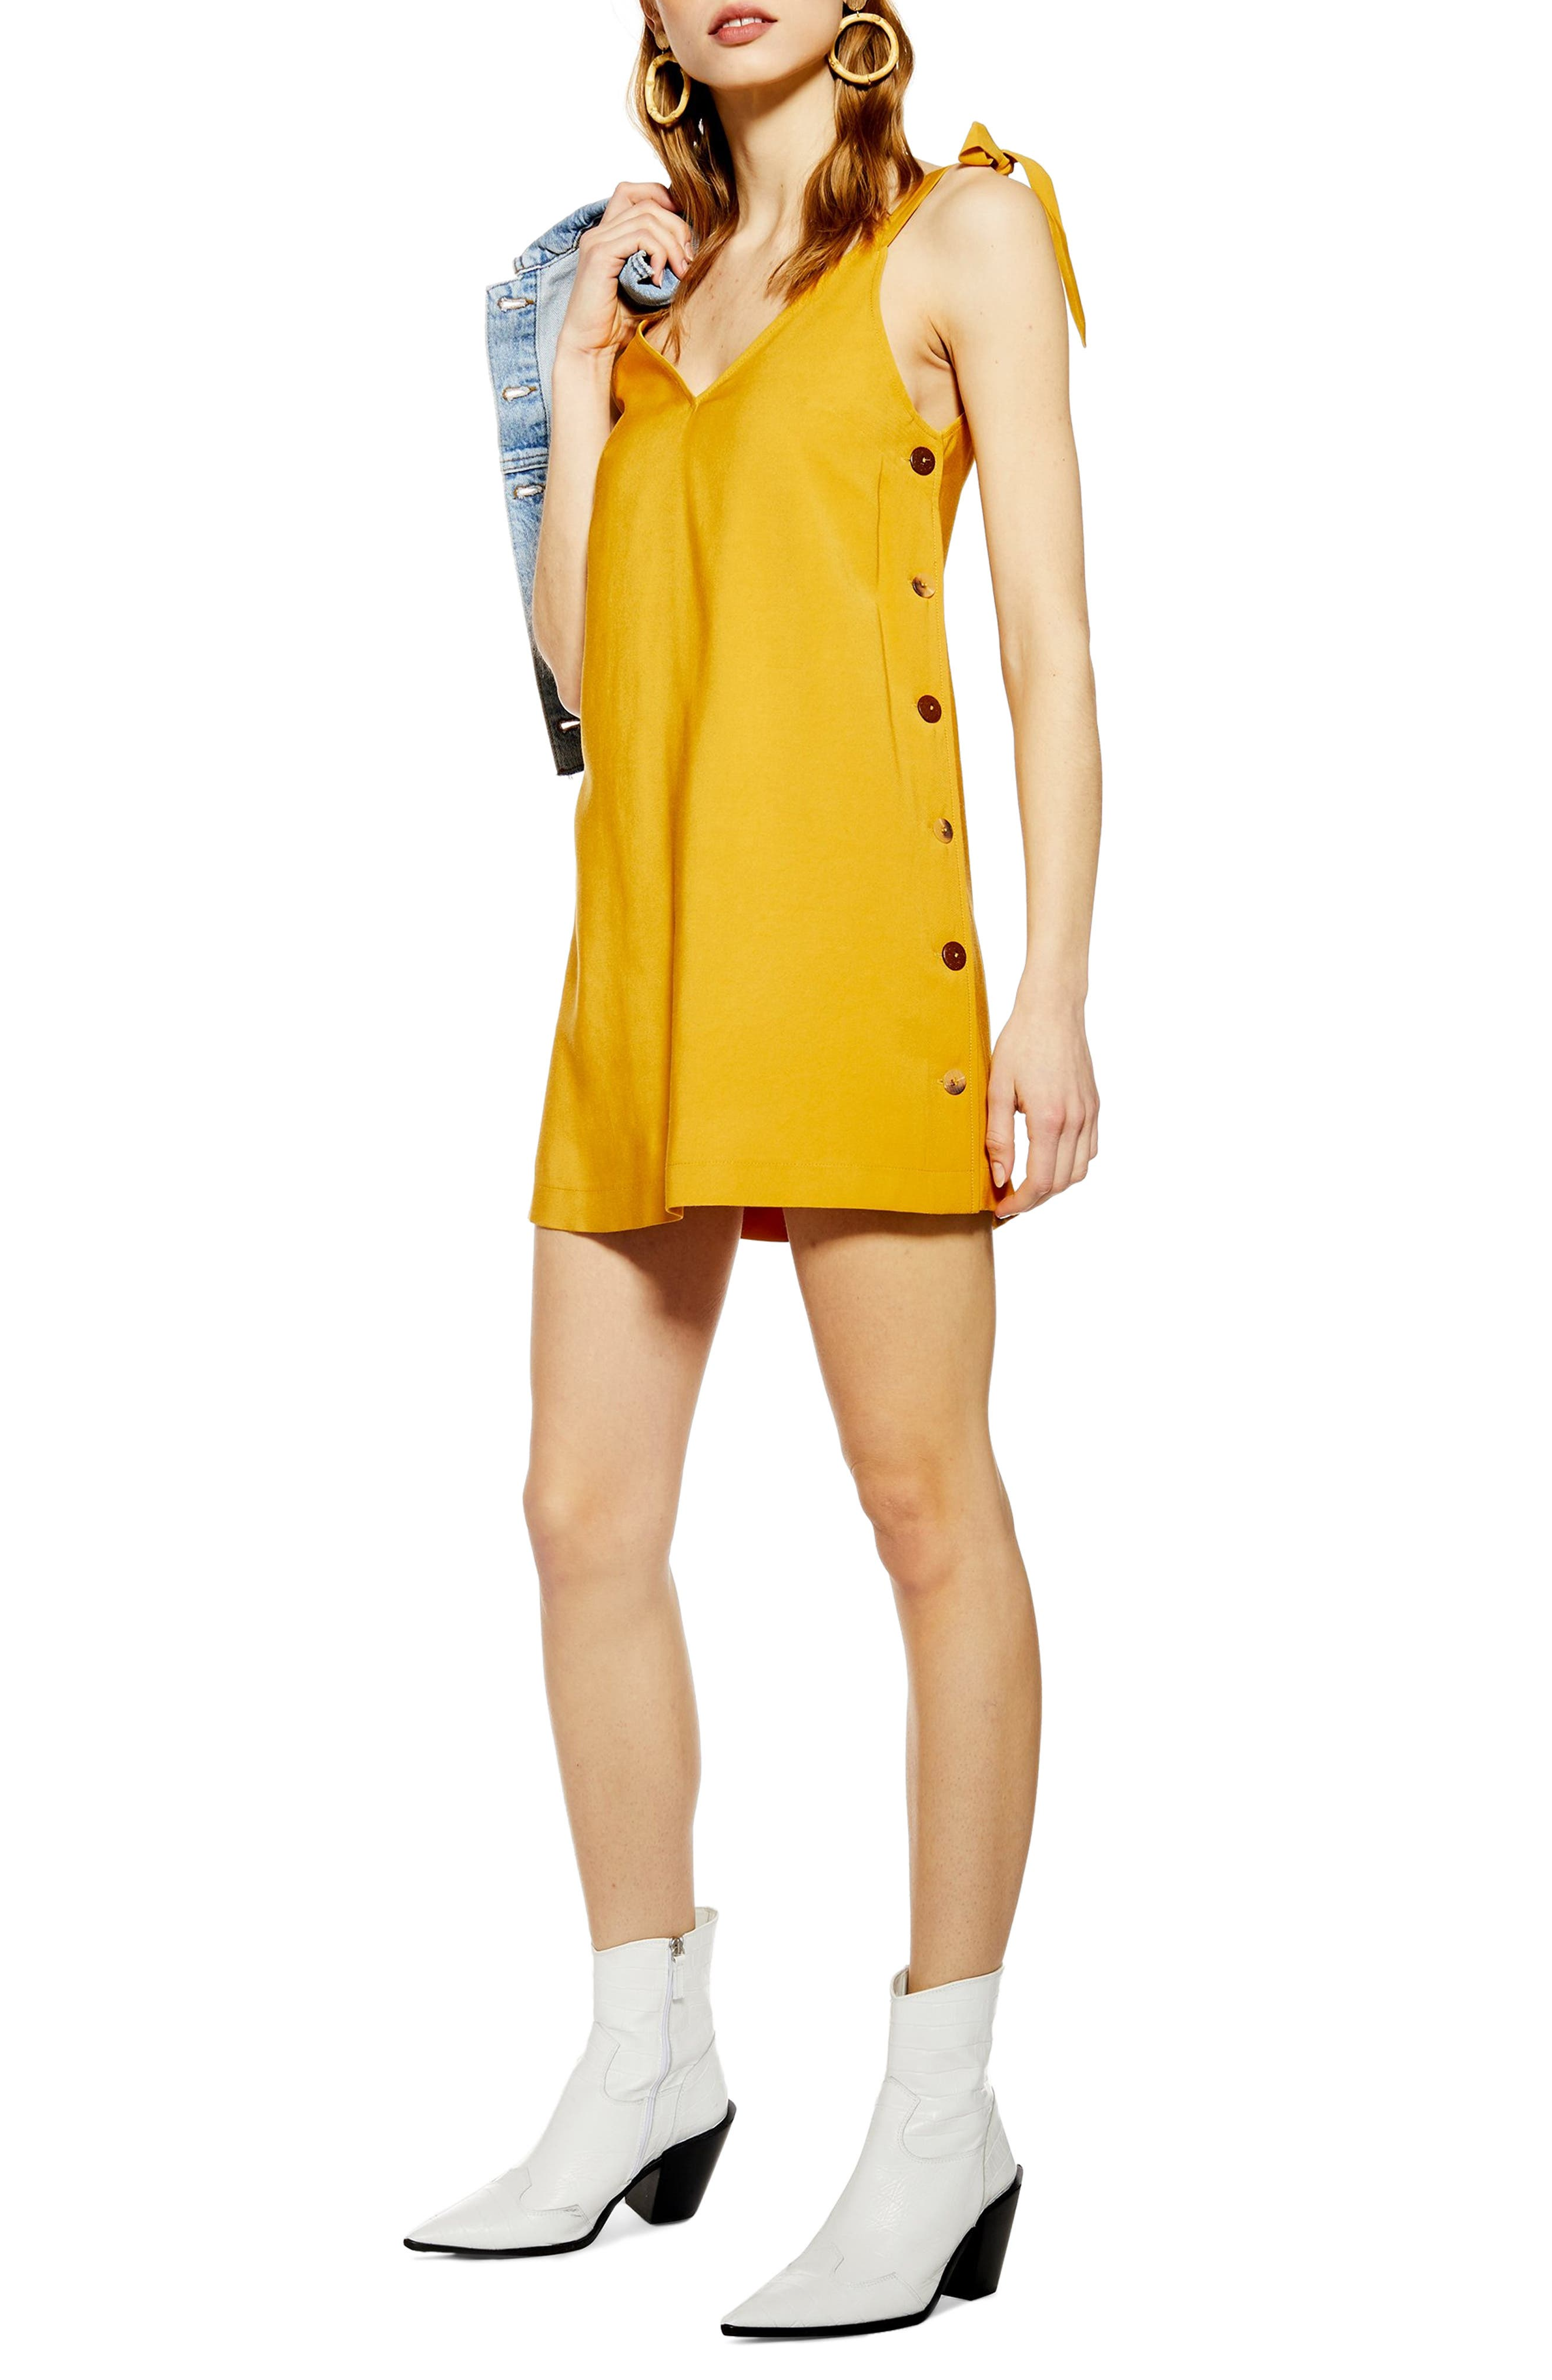 Topshop Tilda Button Mini Slipdress, US (fits like 16-18) - Yellow